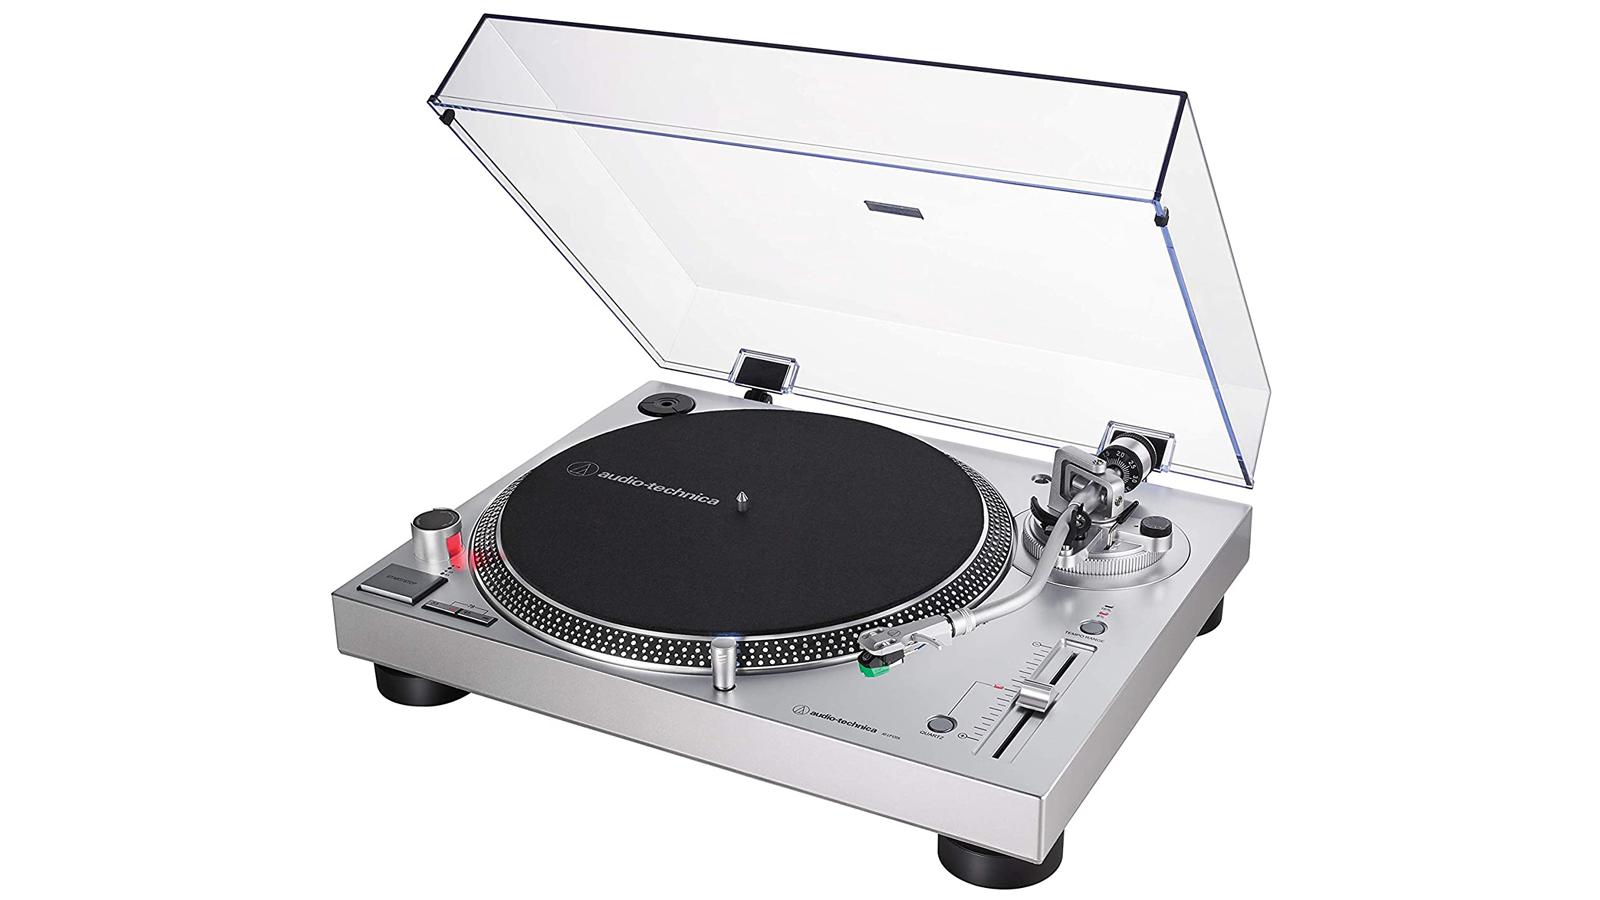 Audio-Technica LP120X turntable best recommendation for new vinyl collectors